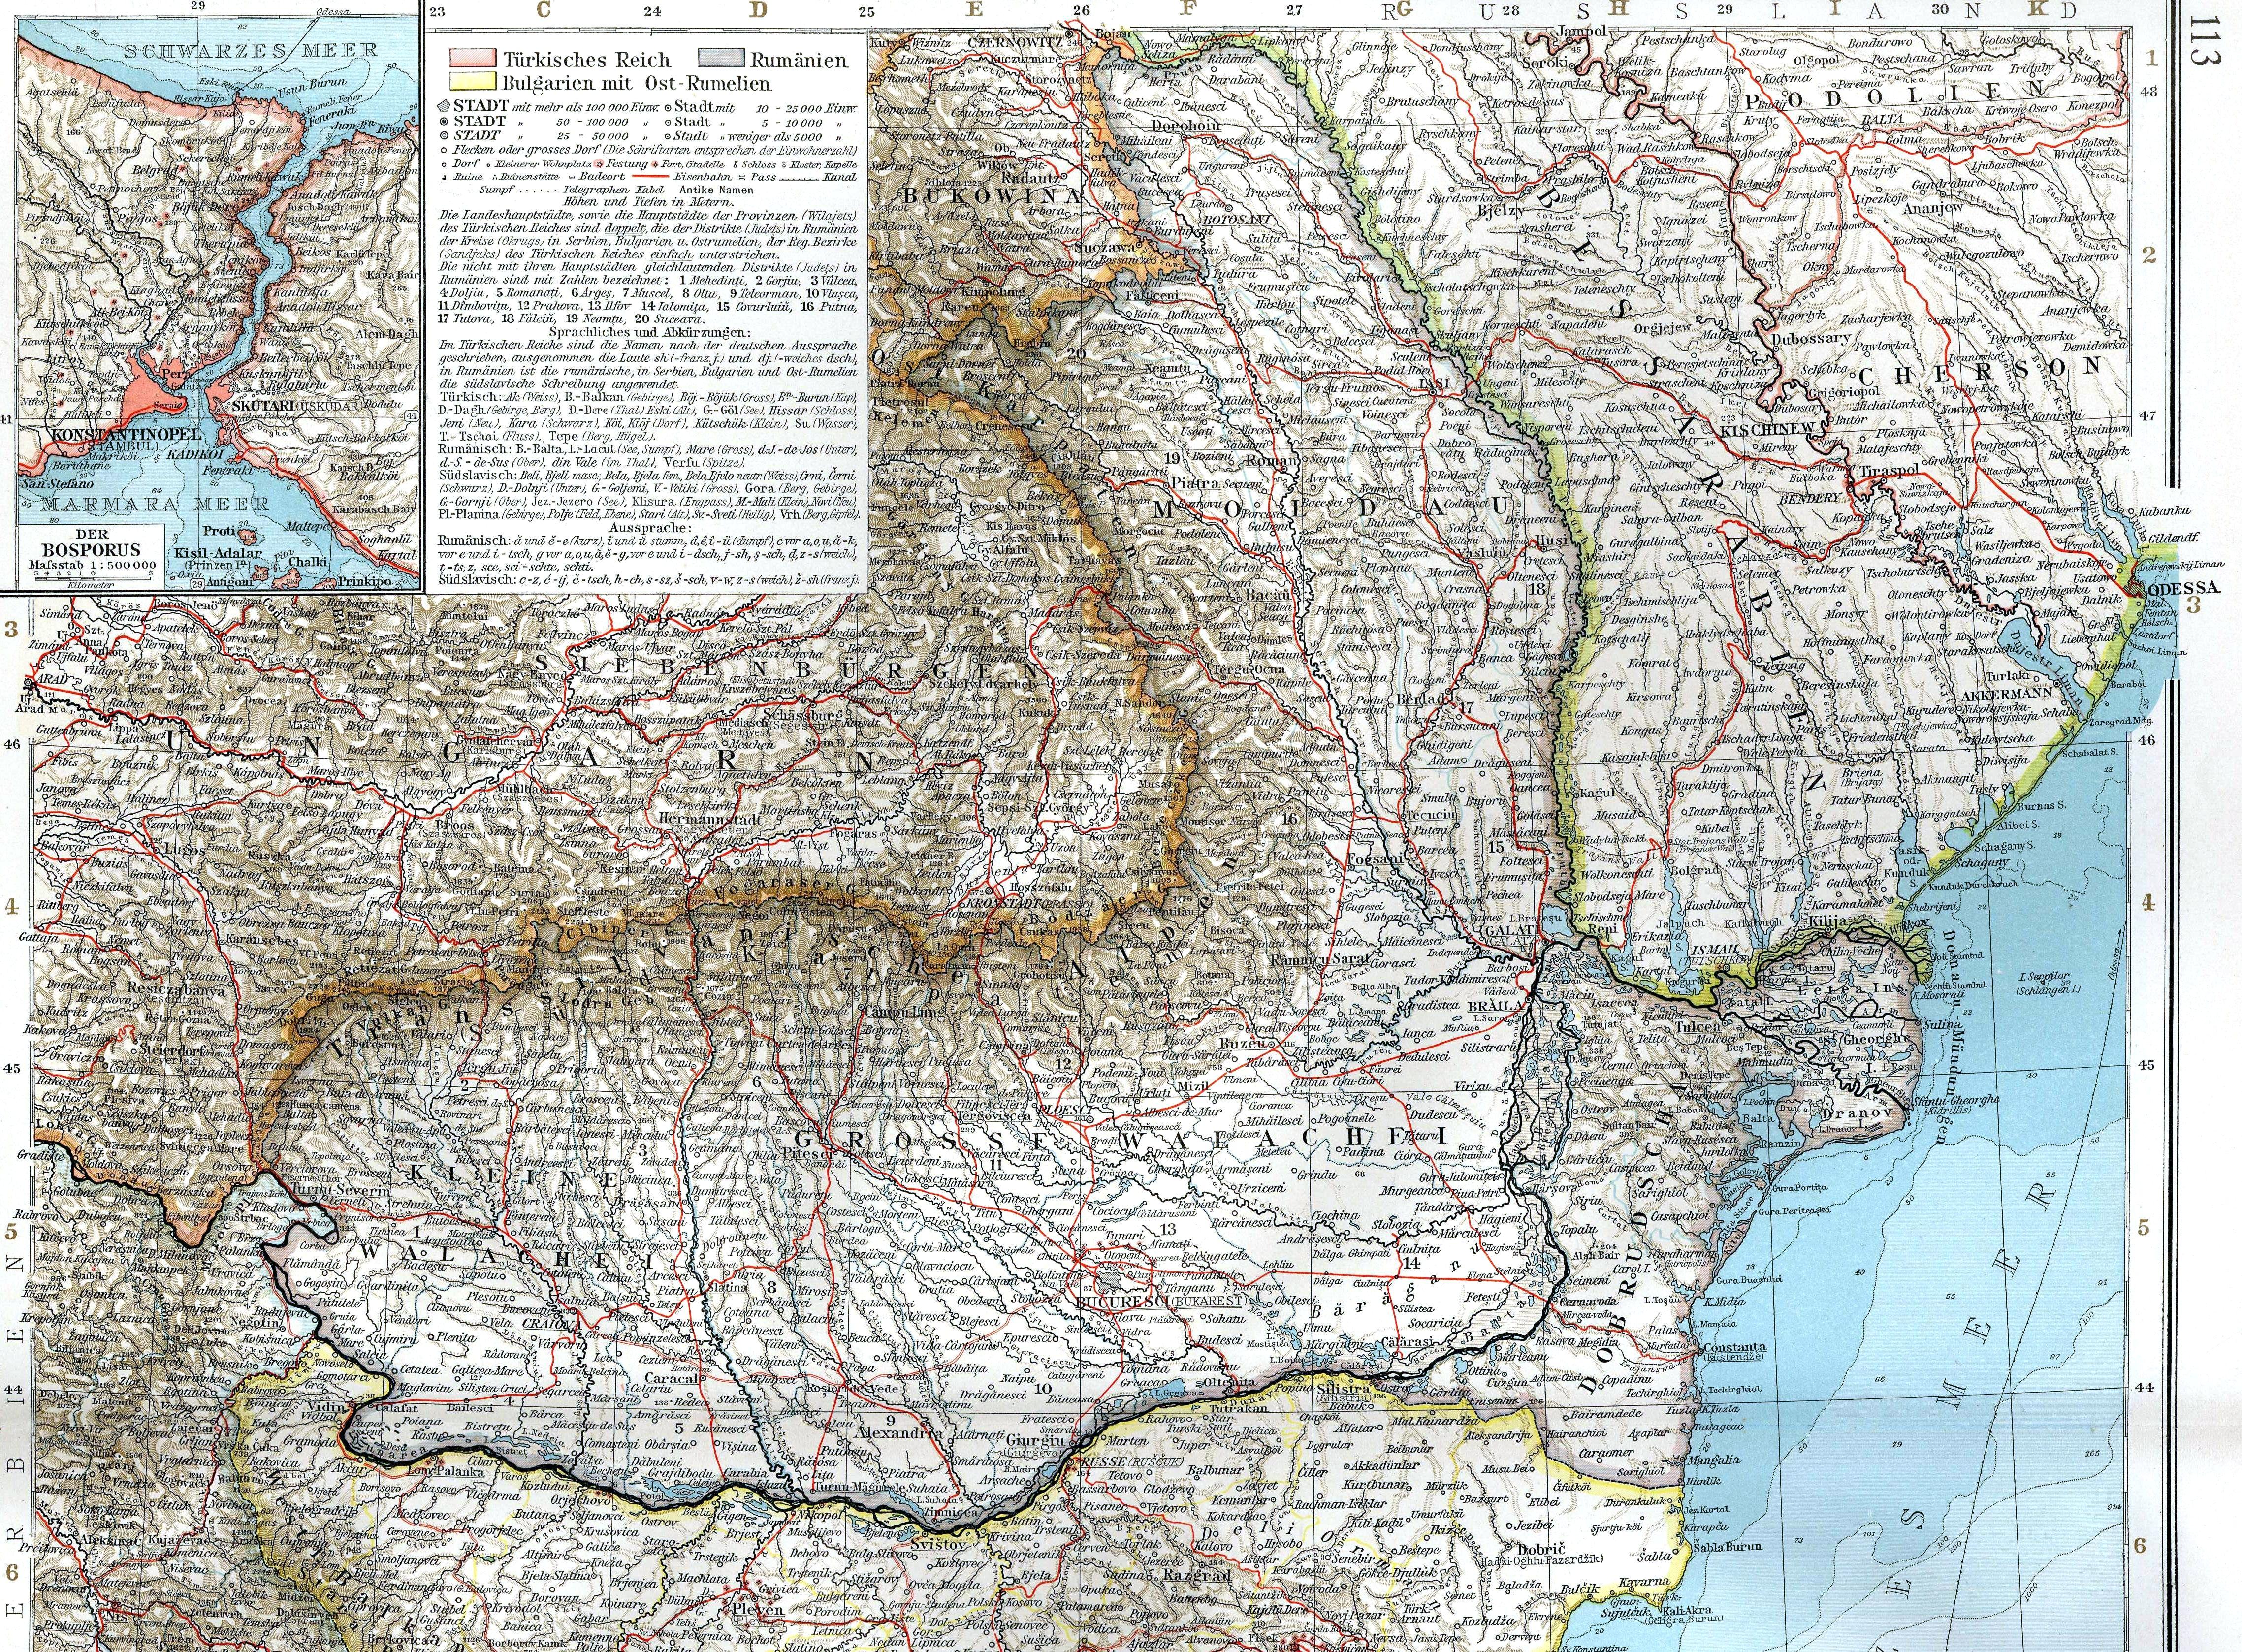 Vechiul Regat Wikipedia